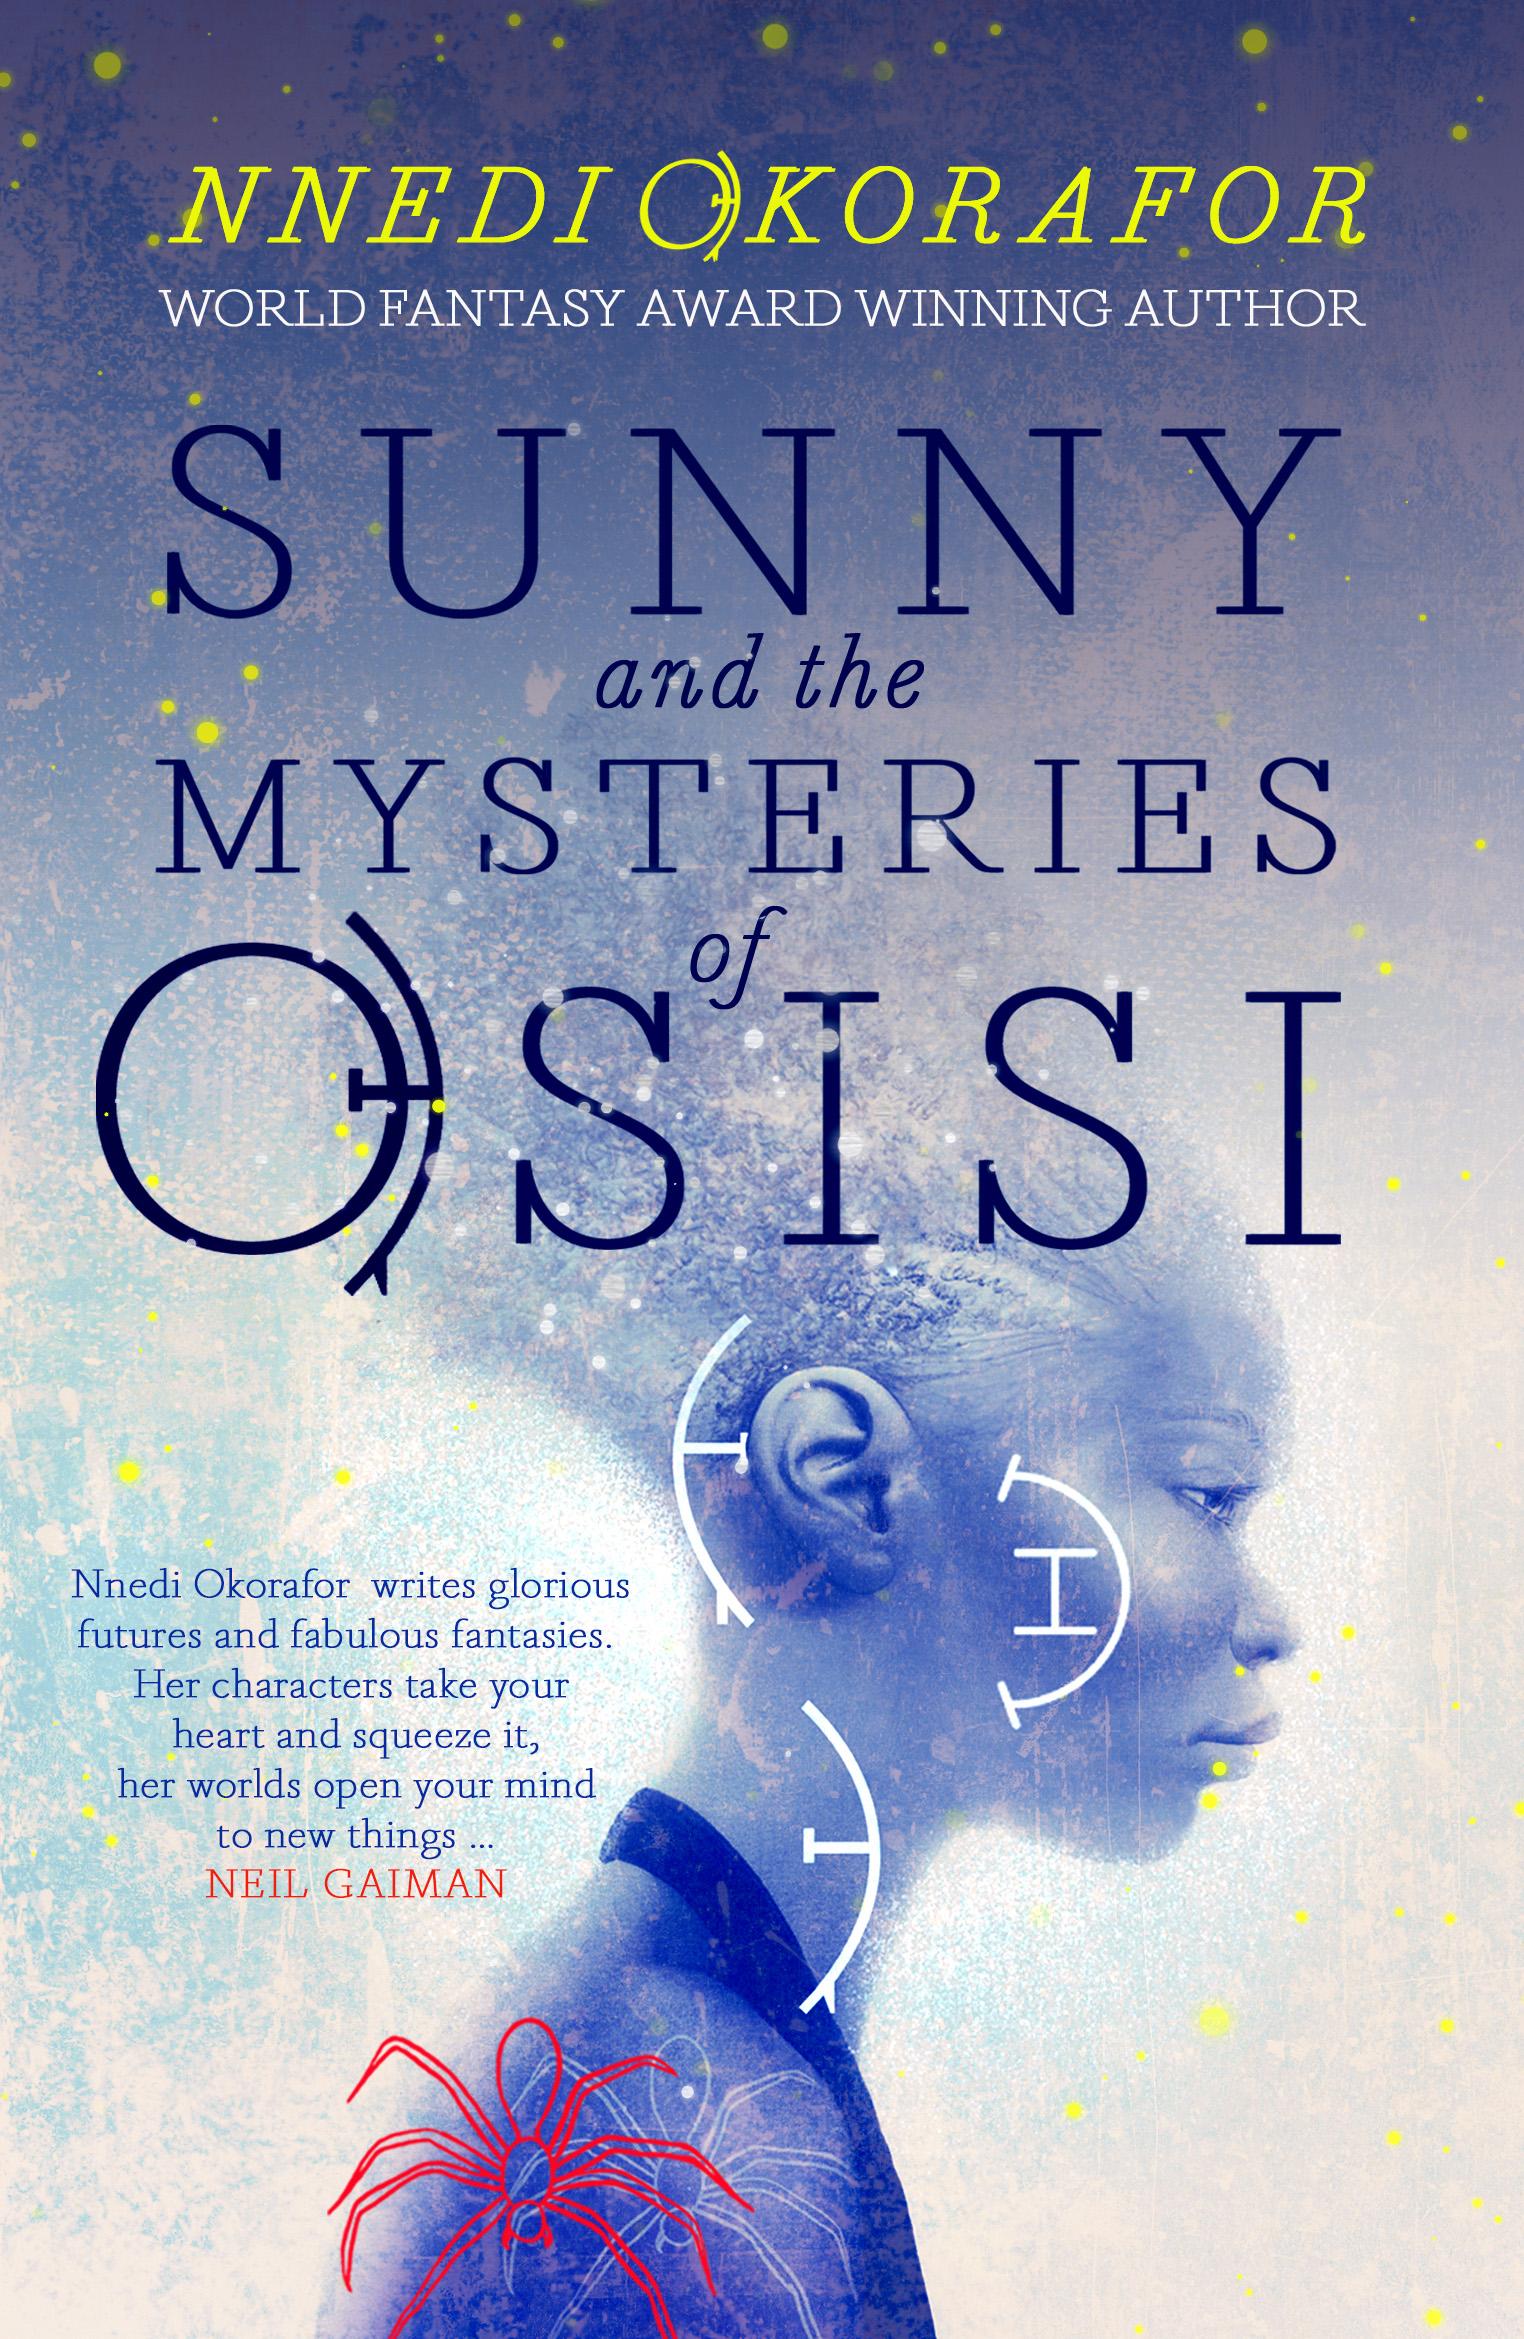 Image: Cassava Republic; Cover Design:Anna Morrison; Illustration:Greg Ruth.